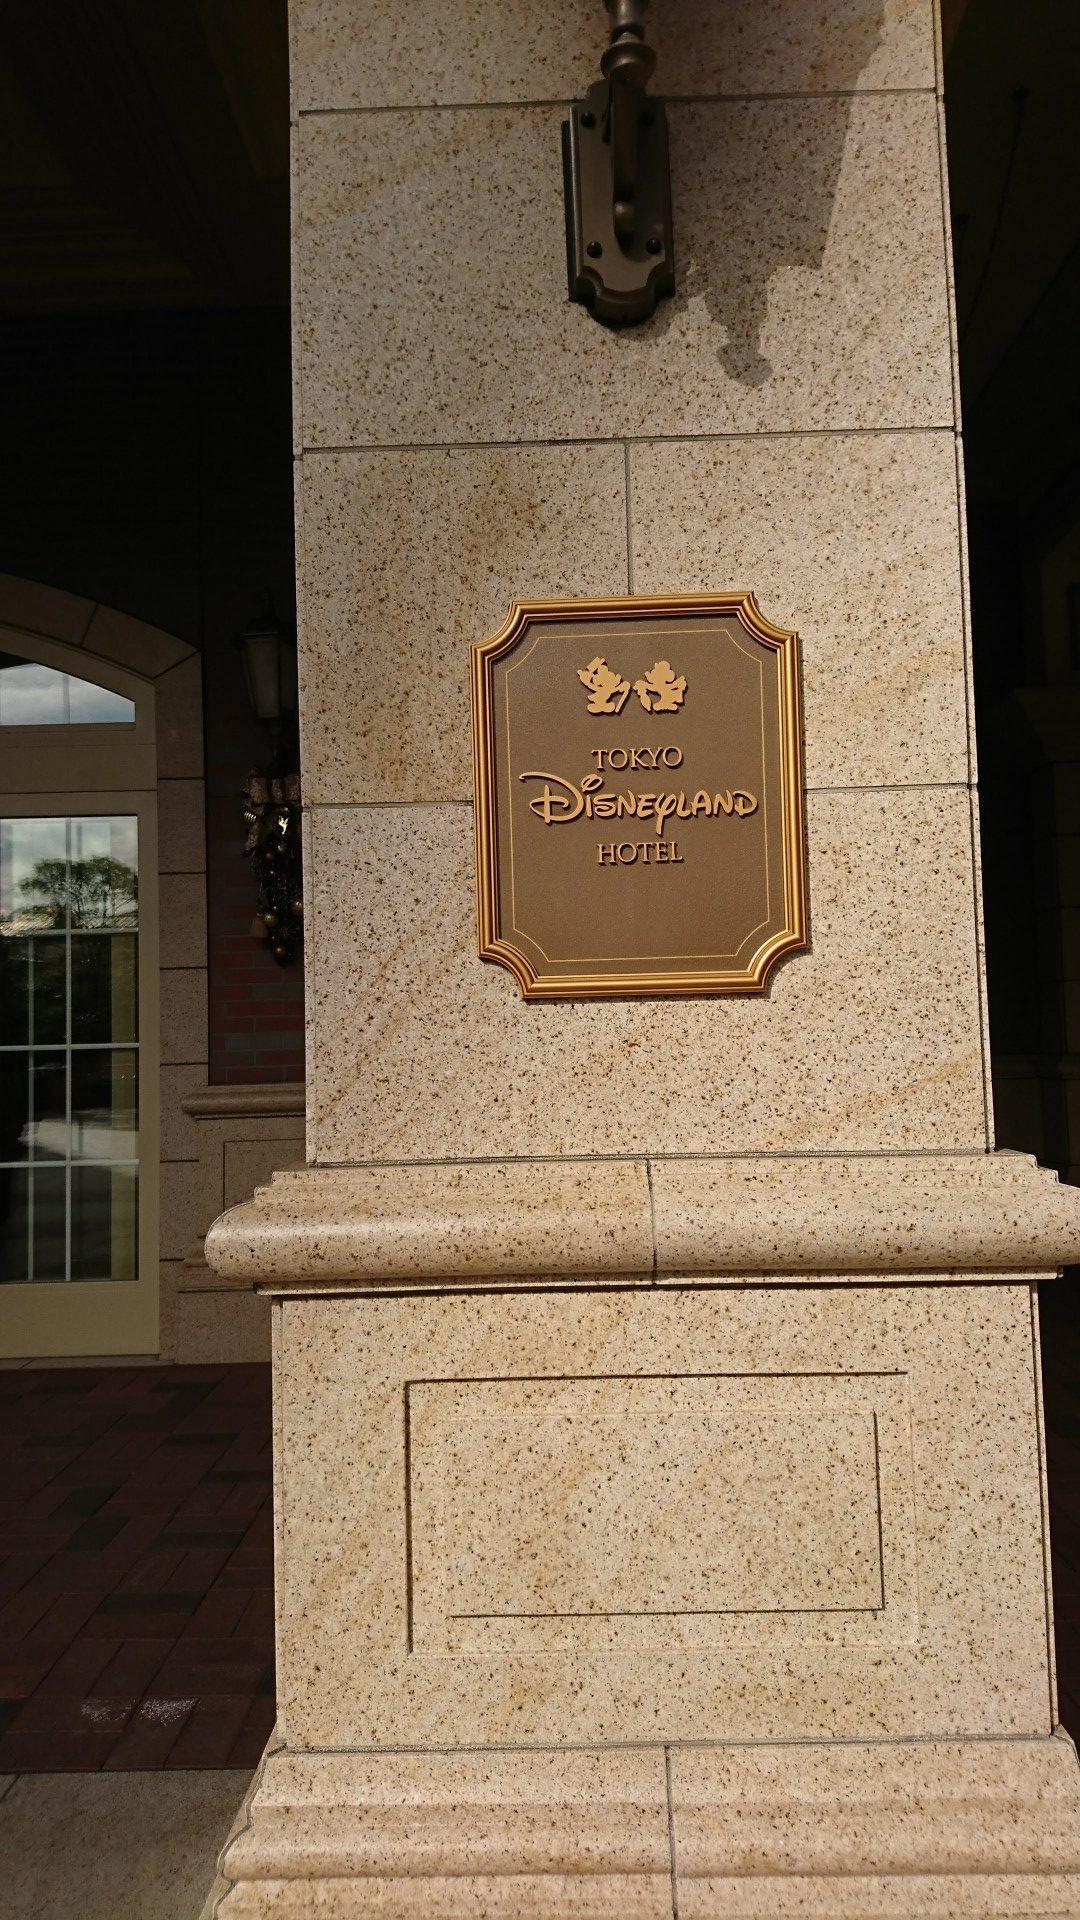 Tokyo Disney Land Hotel